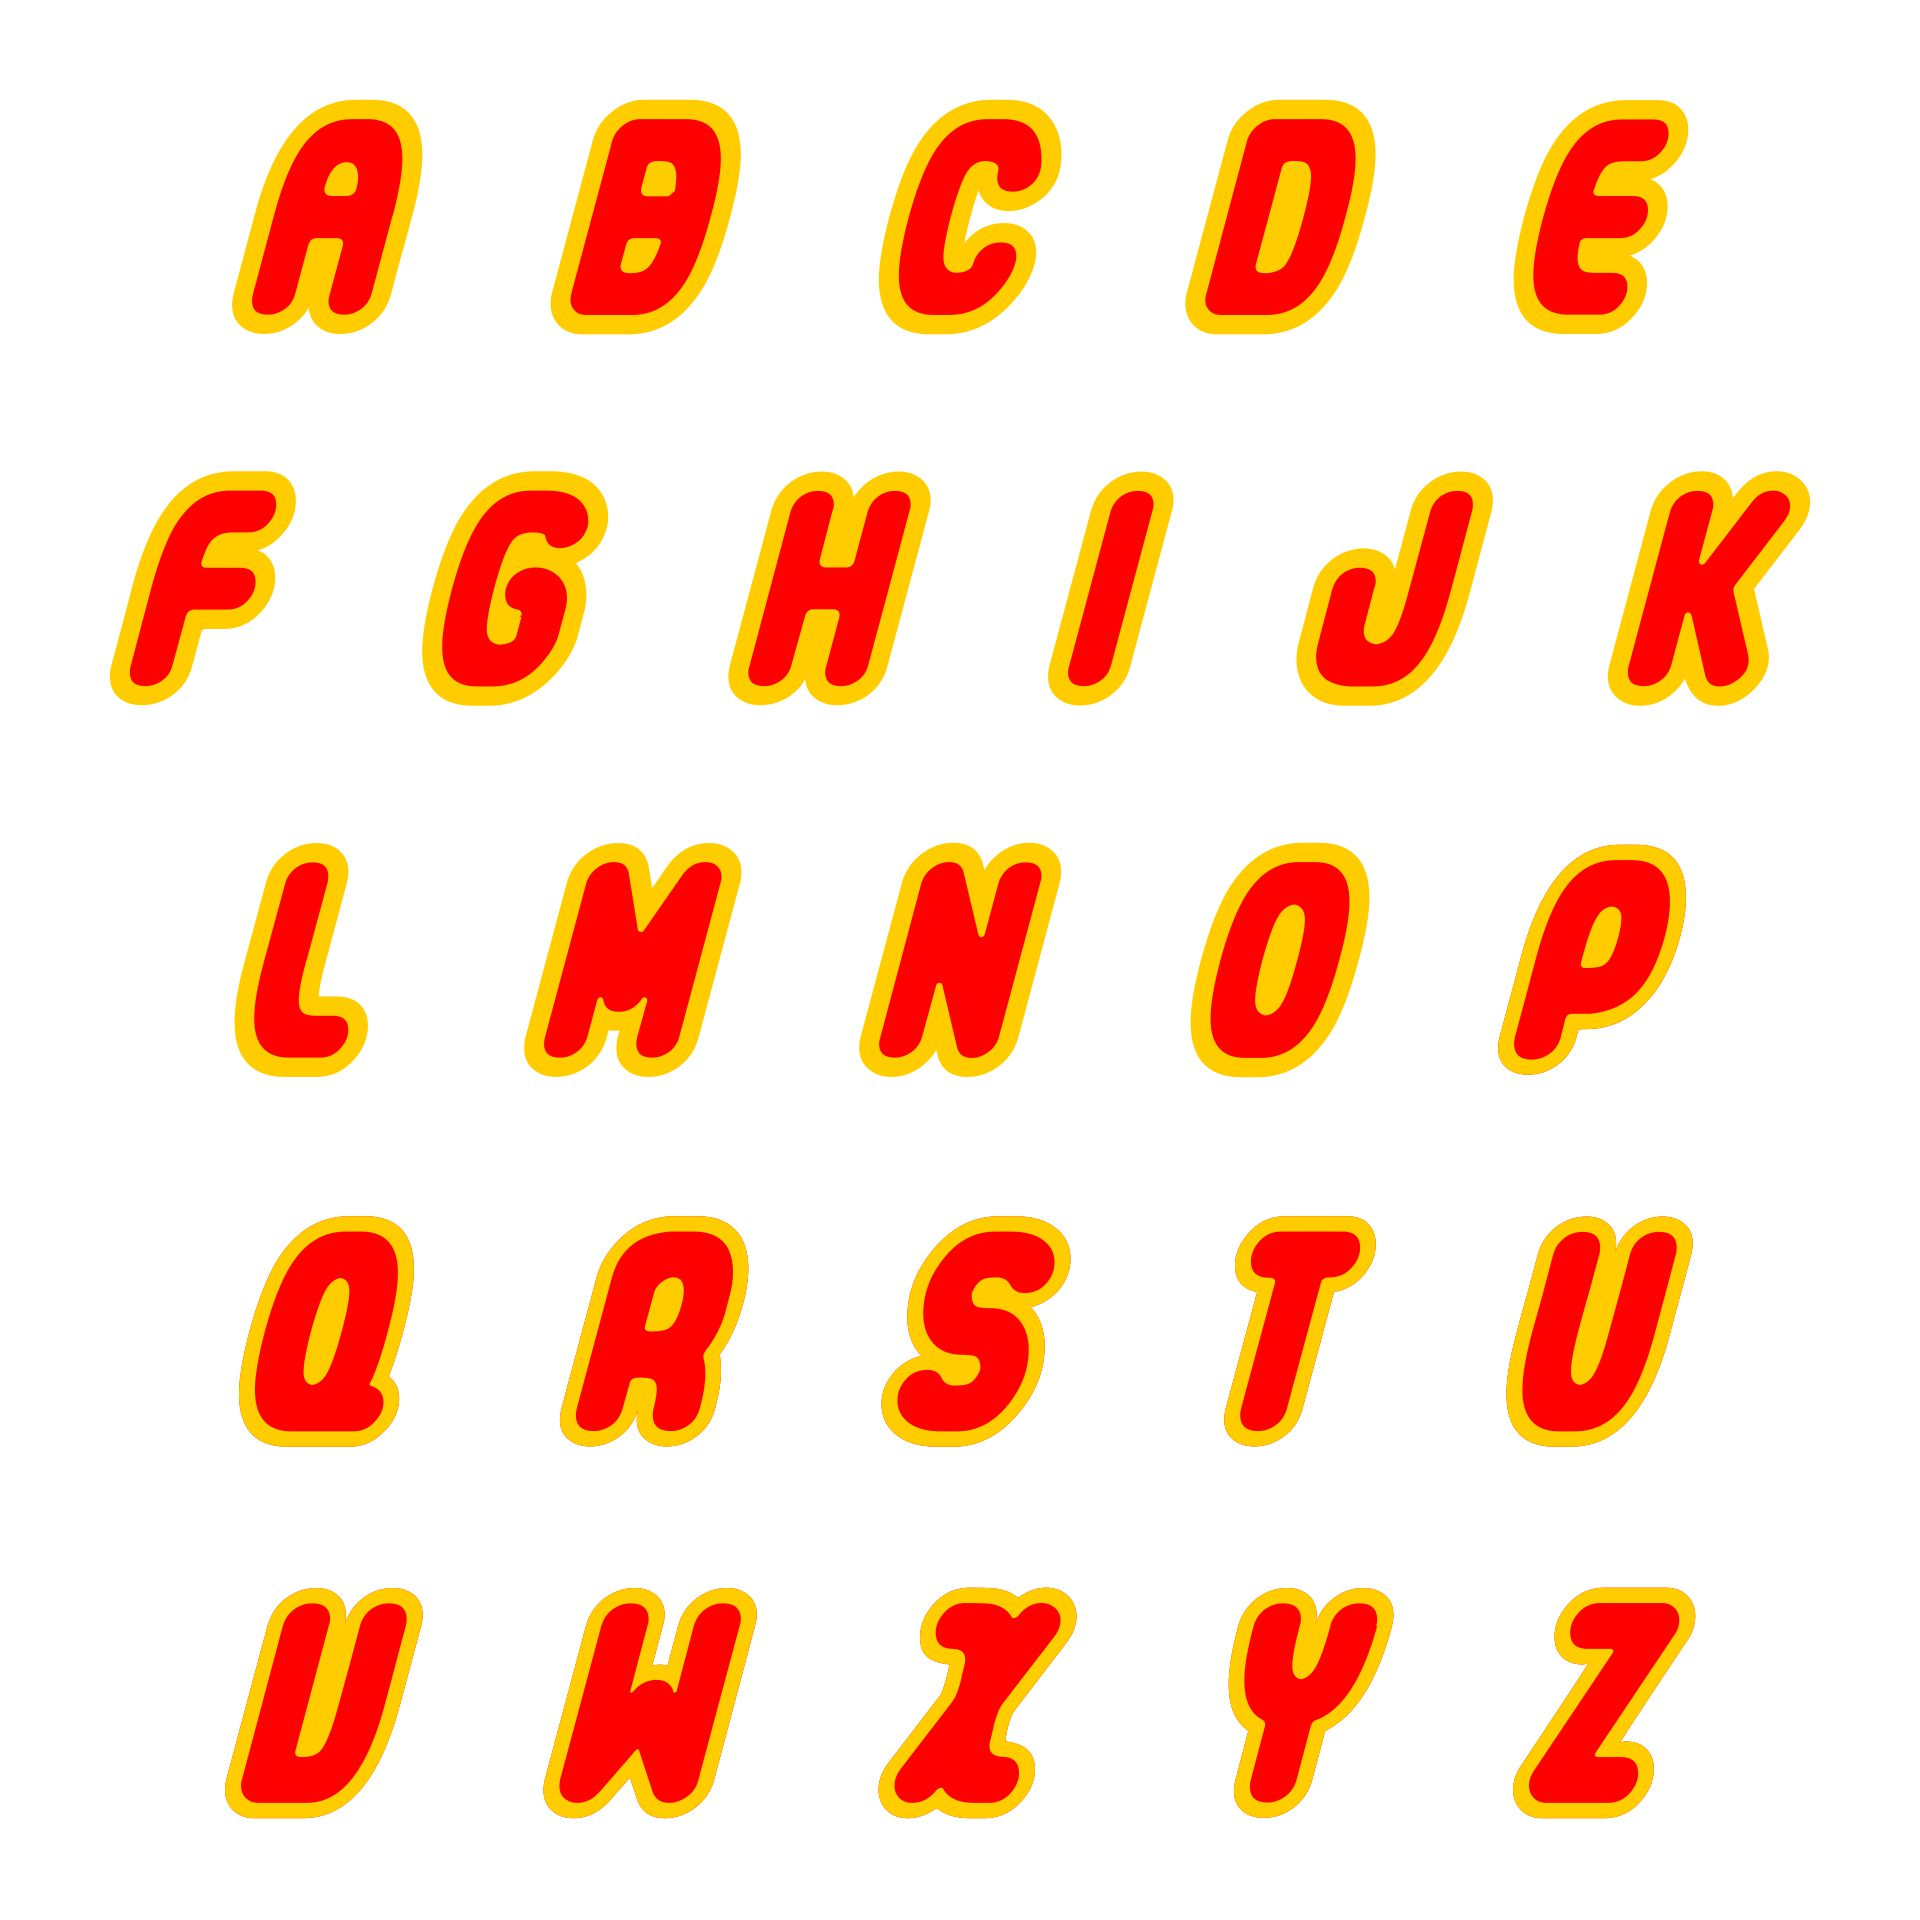 Printable LEGO Letters Font